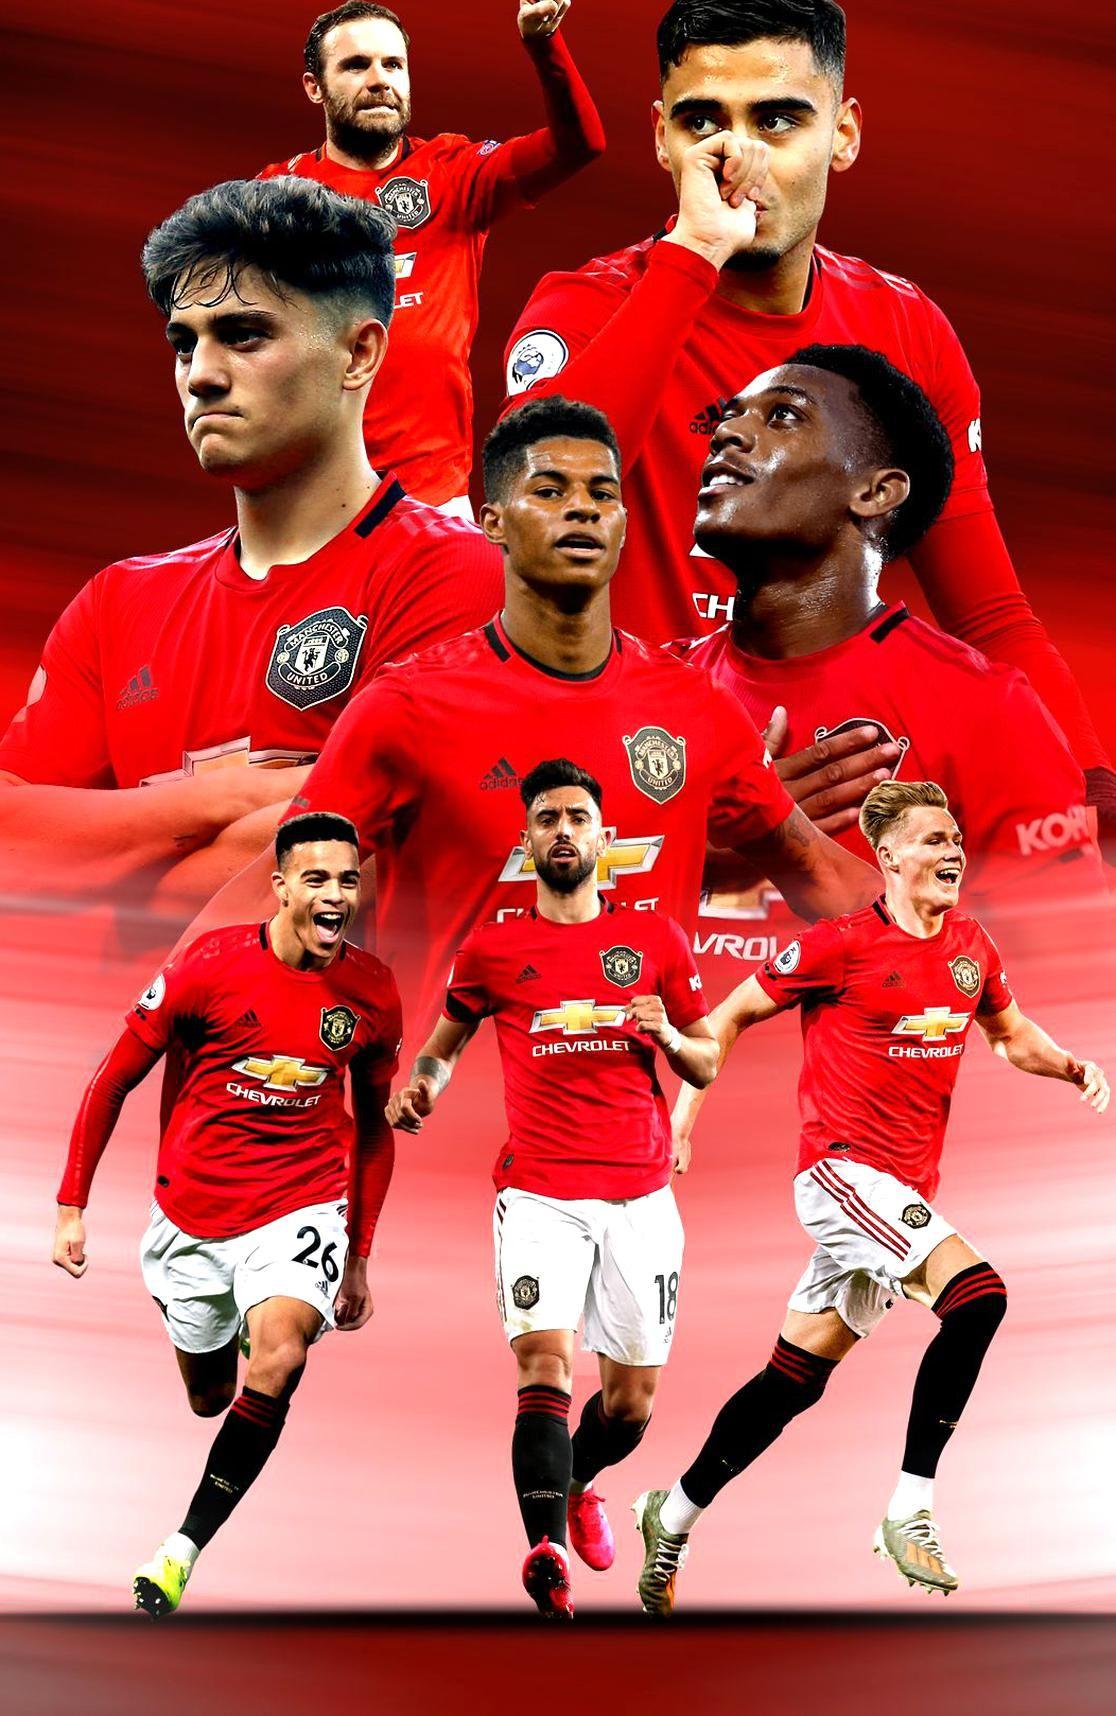 Digital Art Photo Manipulation Premier League Football Wallpaper Soccer Football Ra In 2020 Manchester United Wallpaper Manchester United Poster Manchester United Team